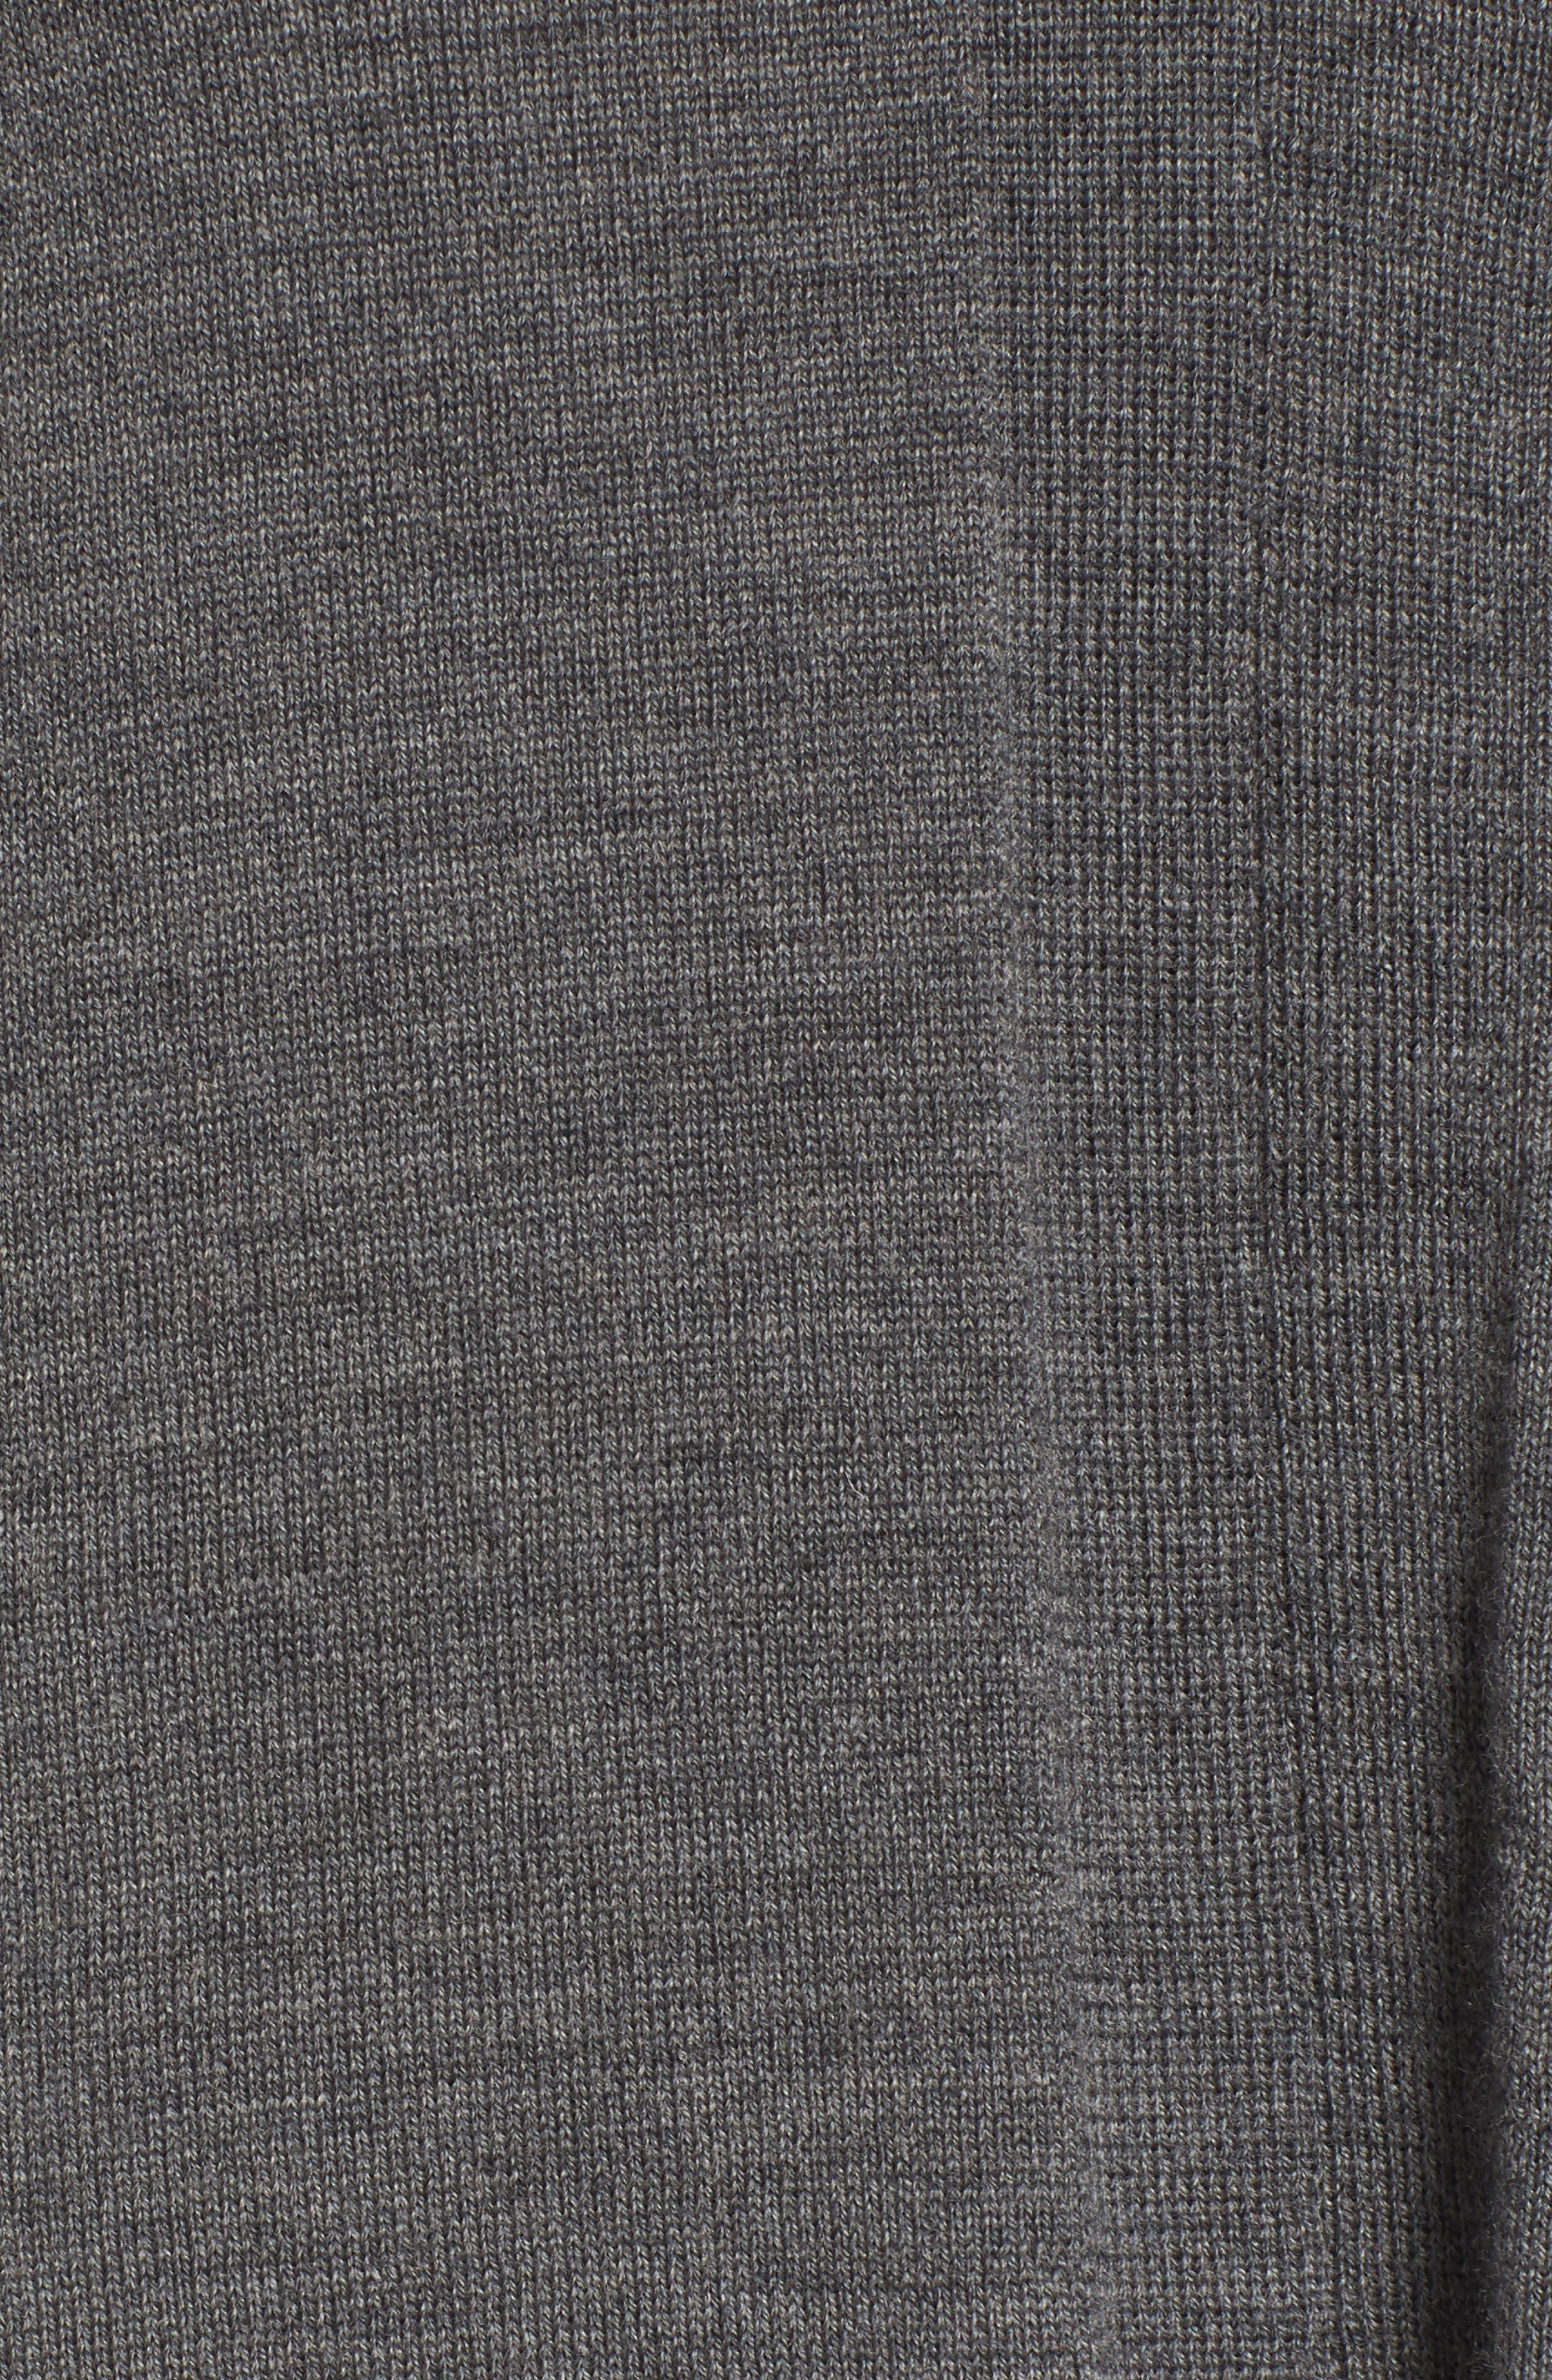 Merino Wool Tunic Sweater,                             Alternate thumbnail 31, color,